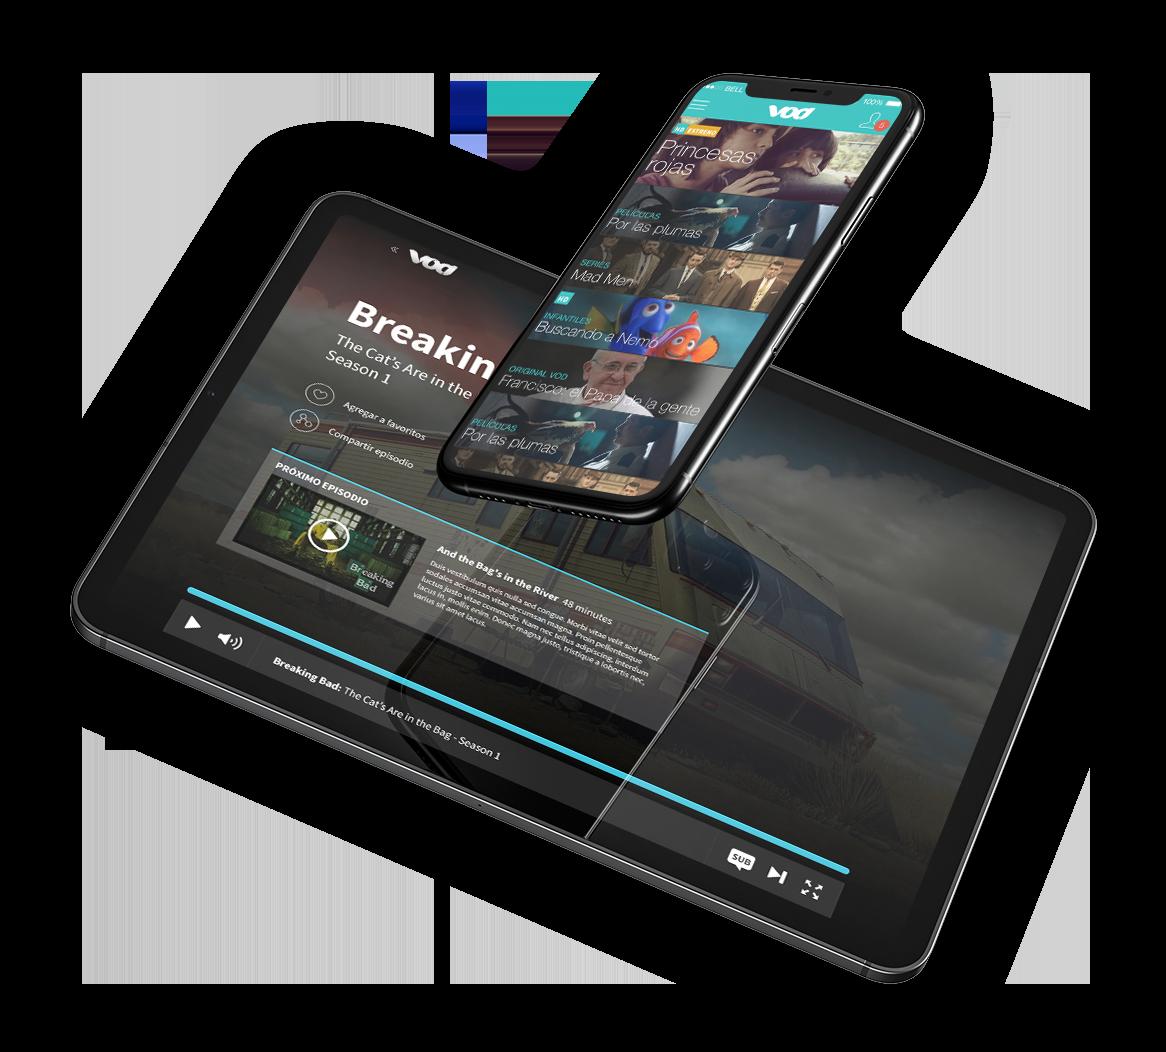 Teletica VOD - iMac / iPhone